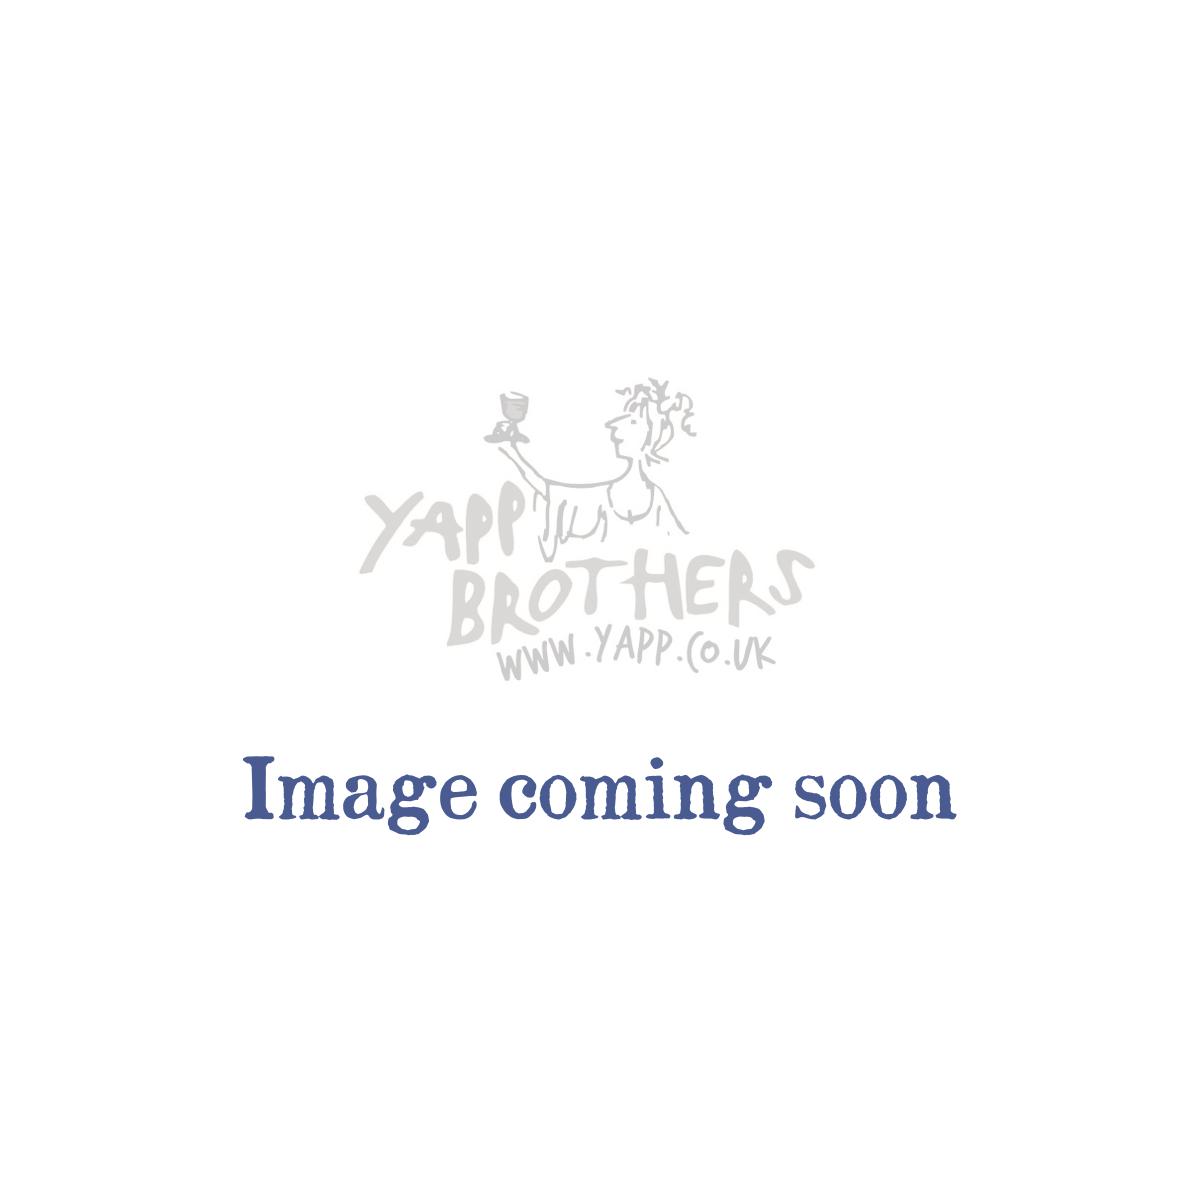 Jura Arbois: Savagnin Domaine Jean-Louis Tissot 2018 - Bottle Rear Label